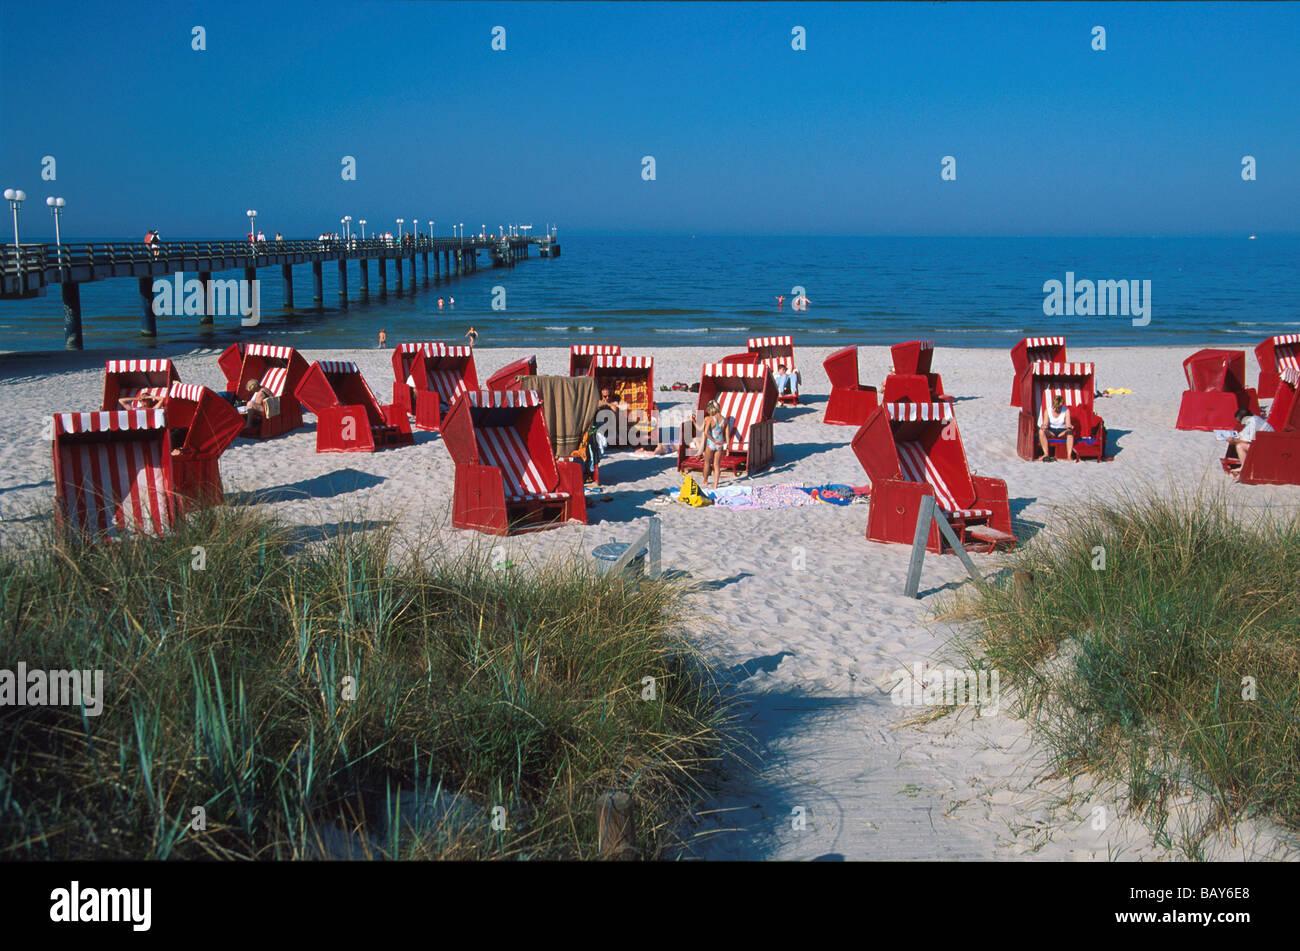 Beach Chairs on the beach of Ostseebad Binz, Ruegen, Mecklenburg-Western Pomerania, Germany Stock Photo